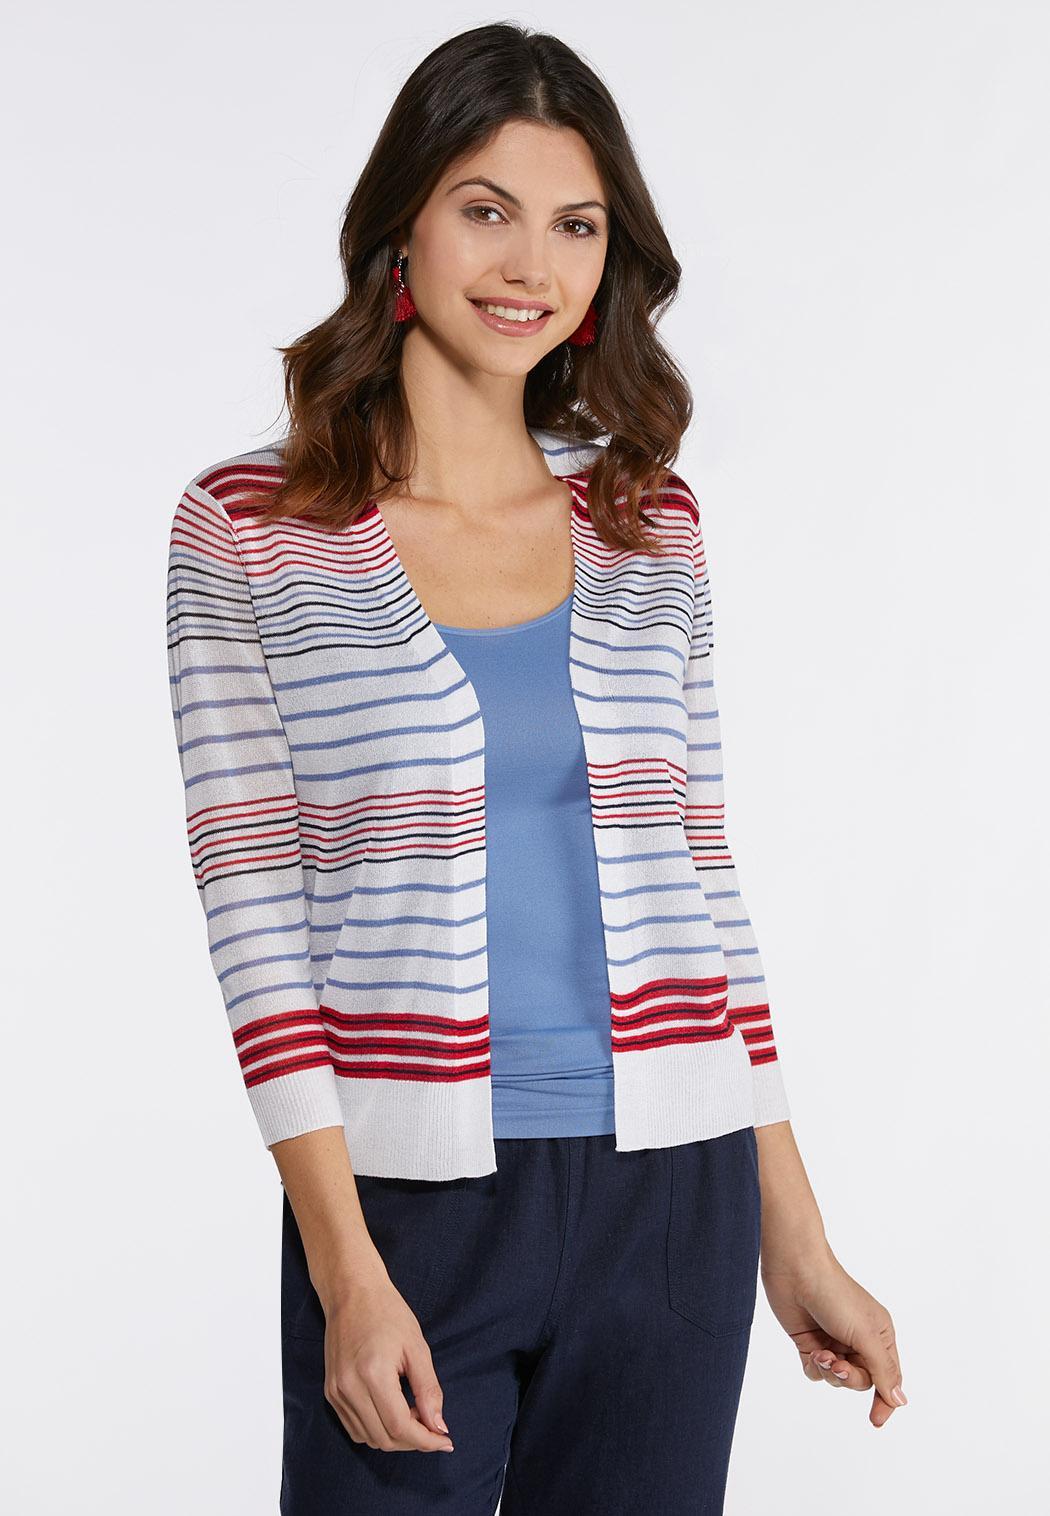 Americana Cardigan Sweater